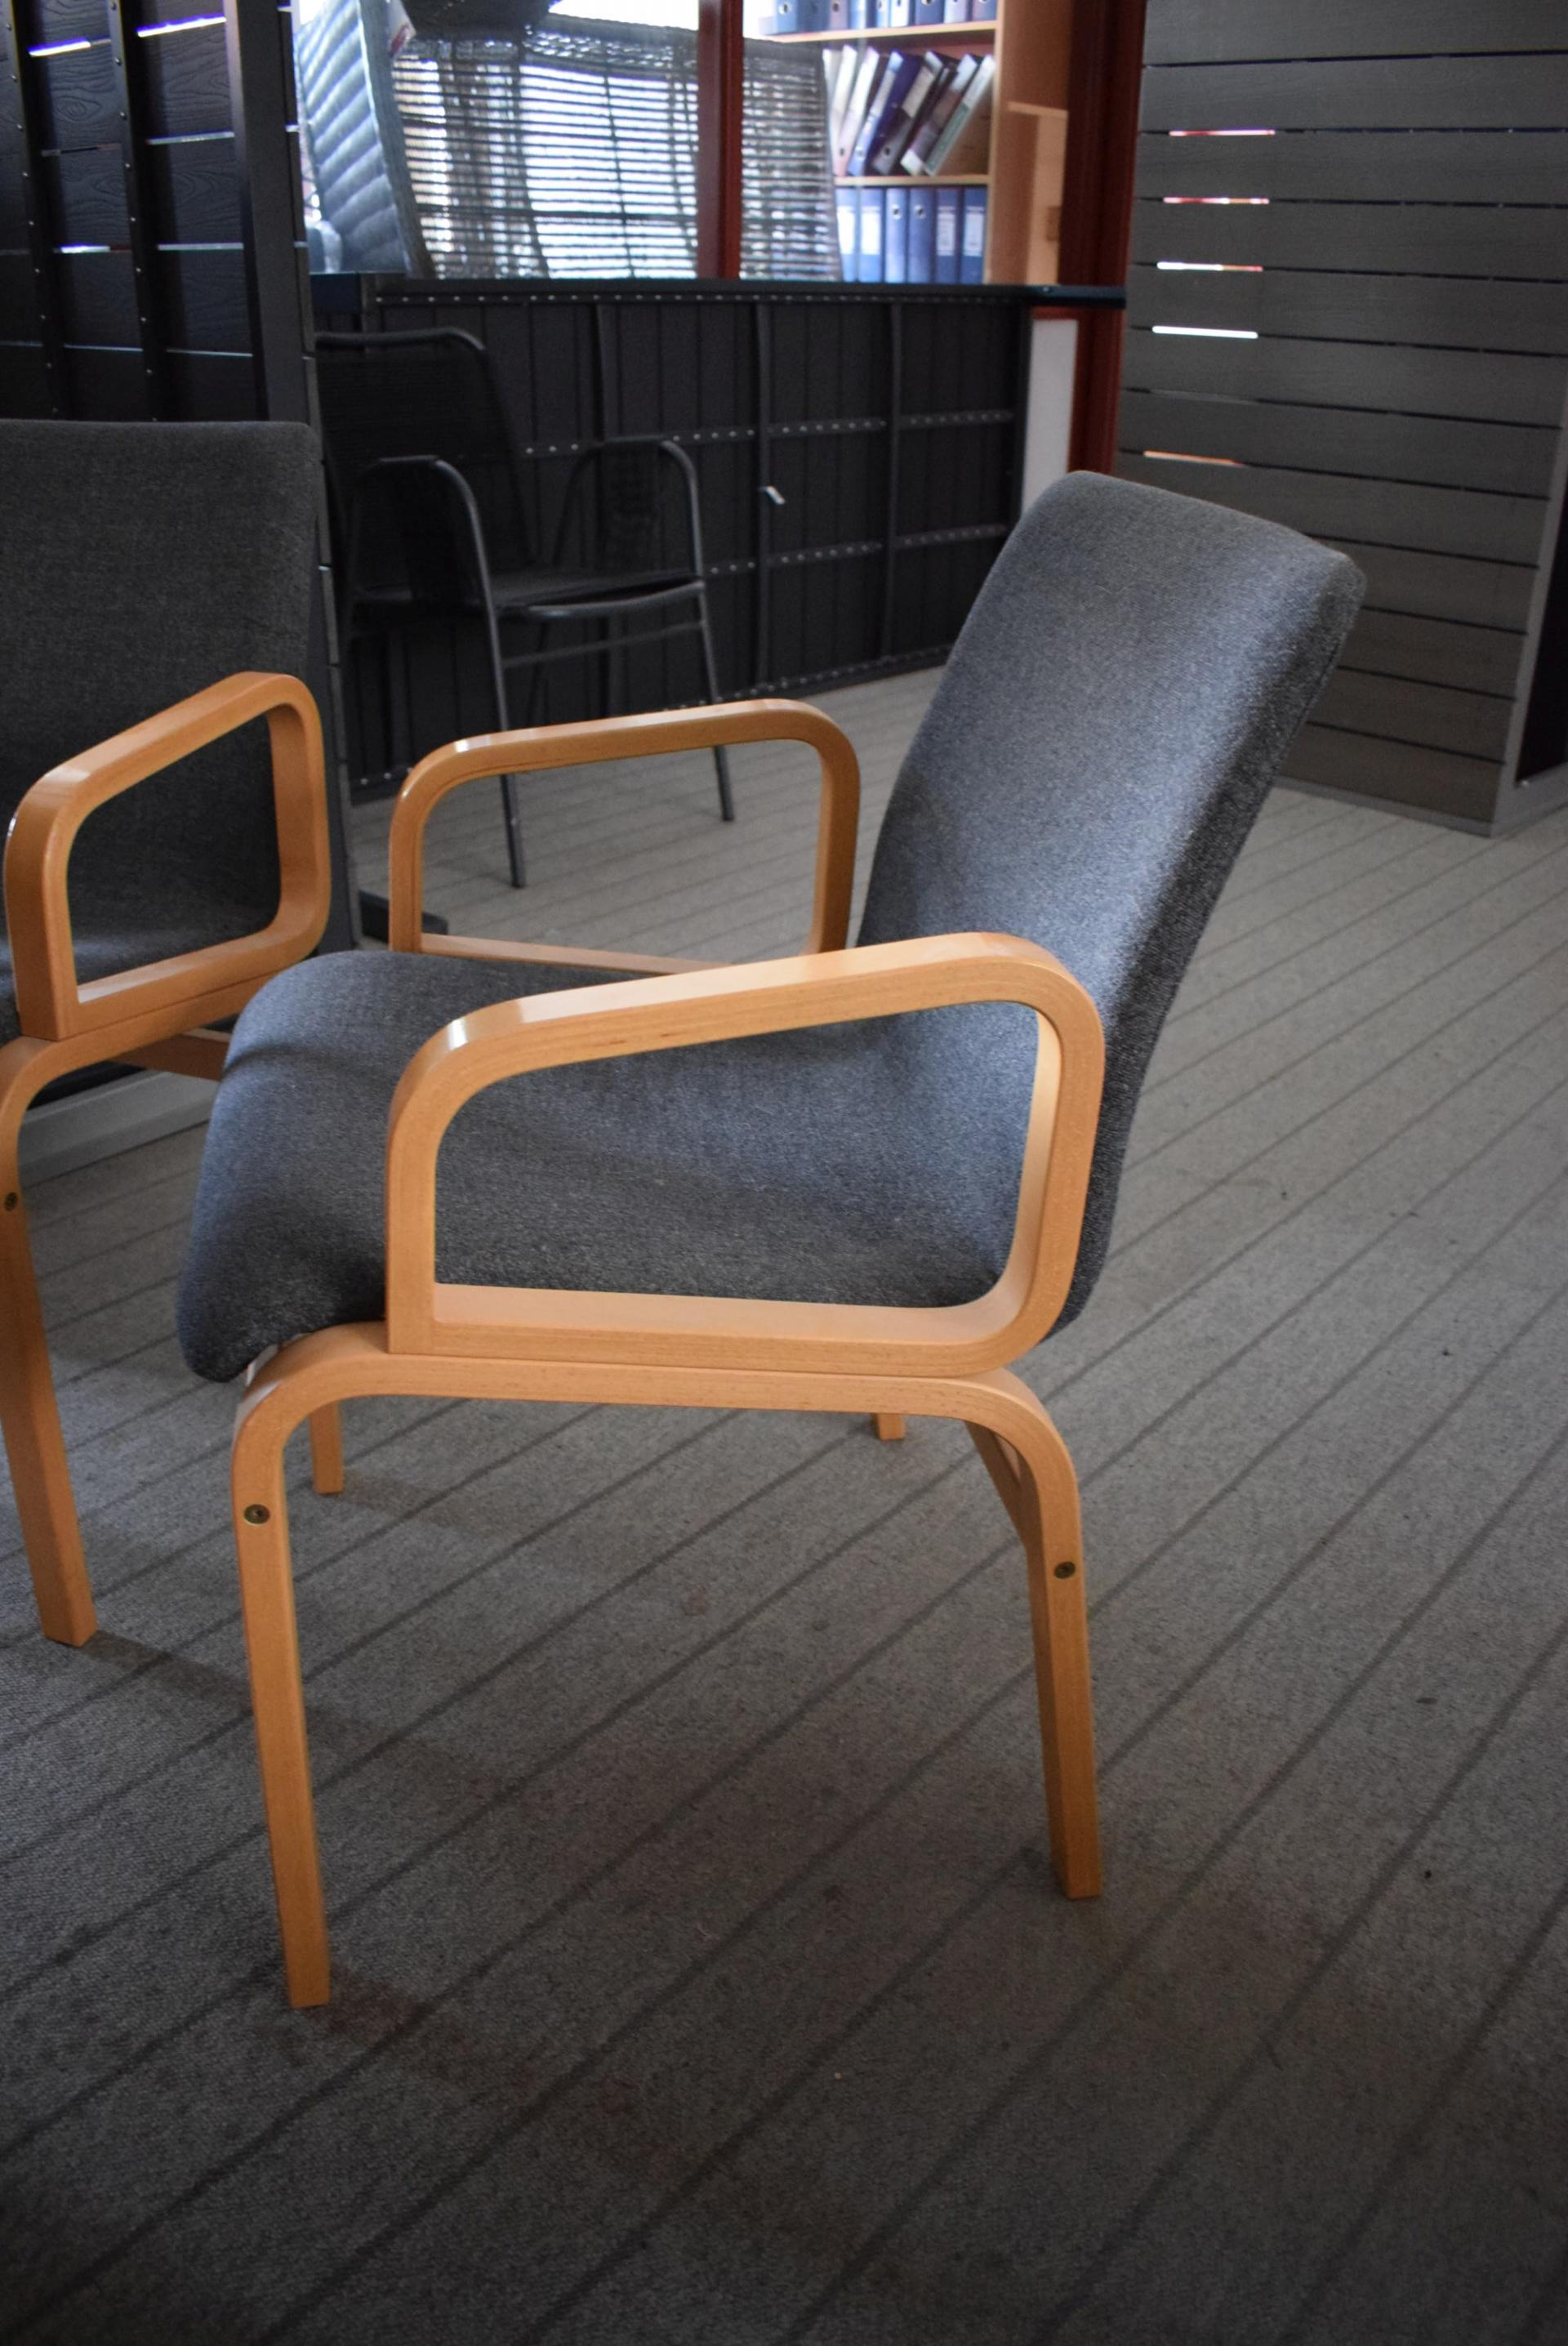 Mødebord 108 x 190 cm + 8 stole KJ Auktion Maskinauktioner